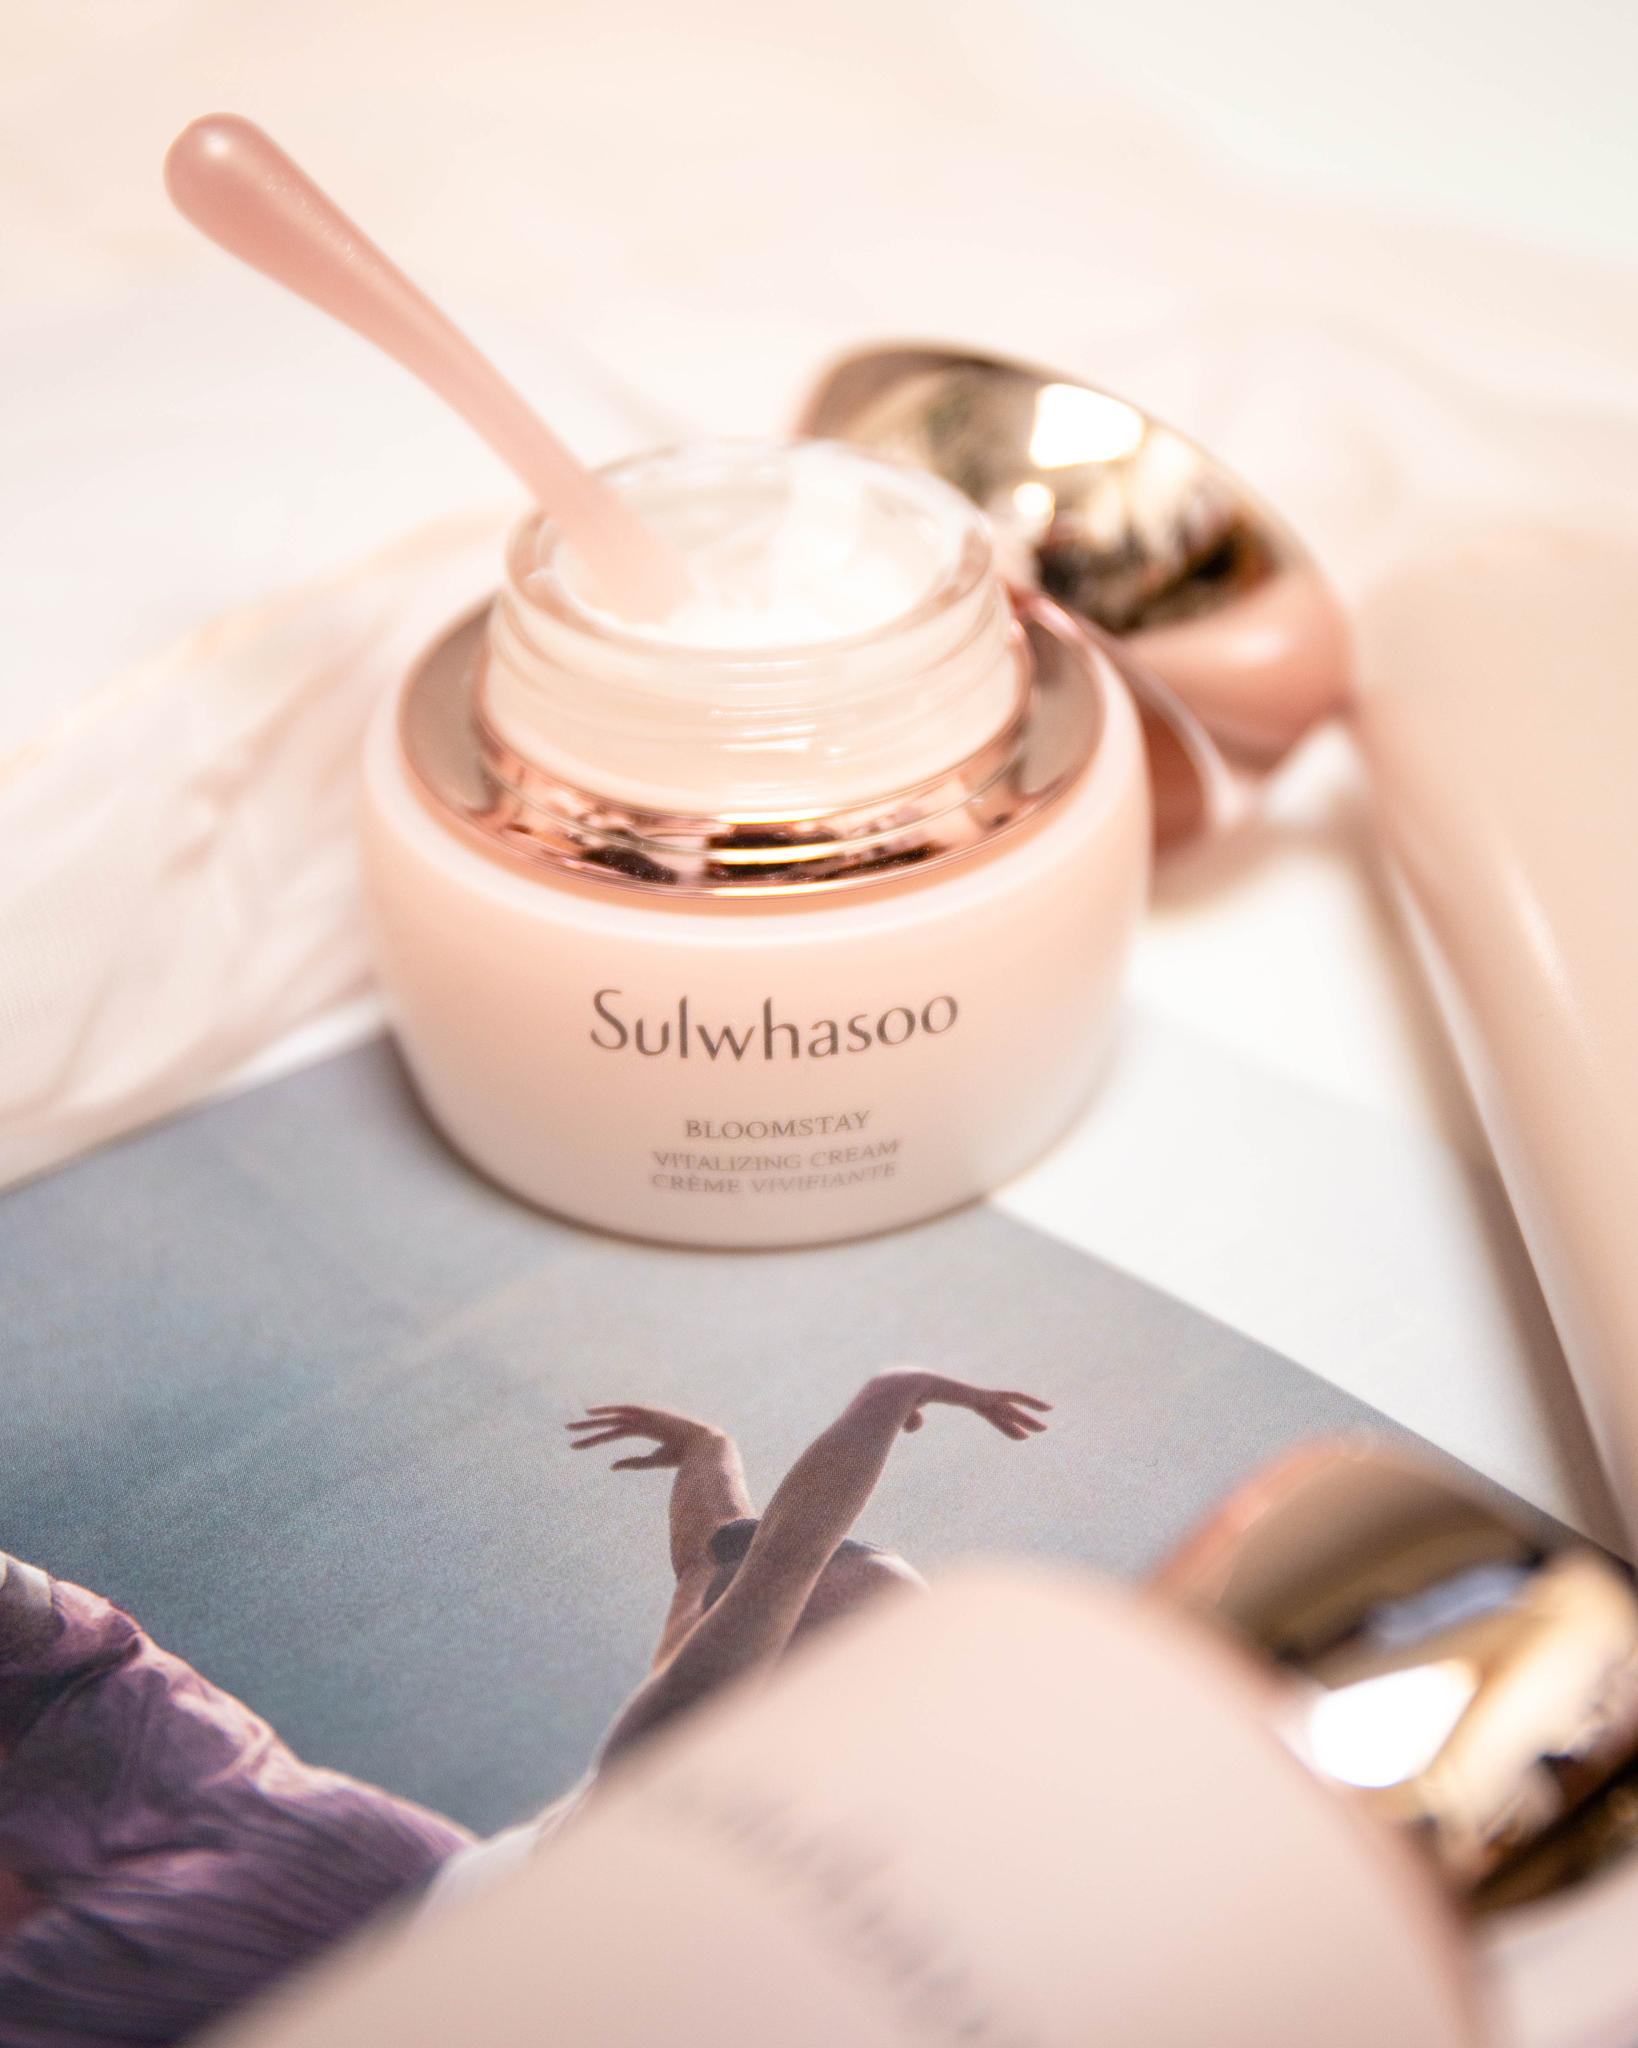 Sulwhasoo Bloomstay Cream